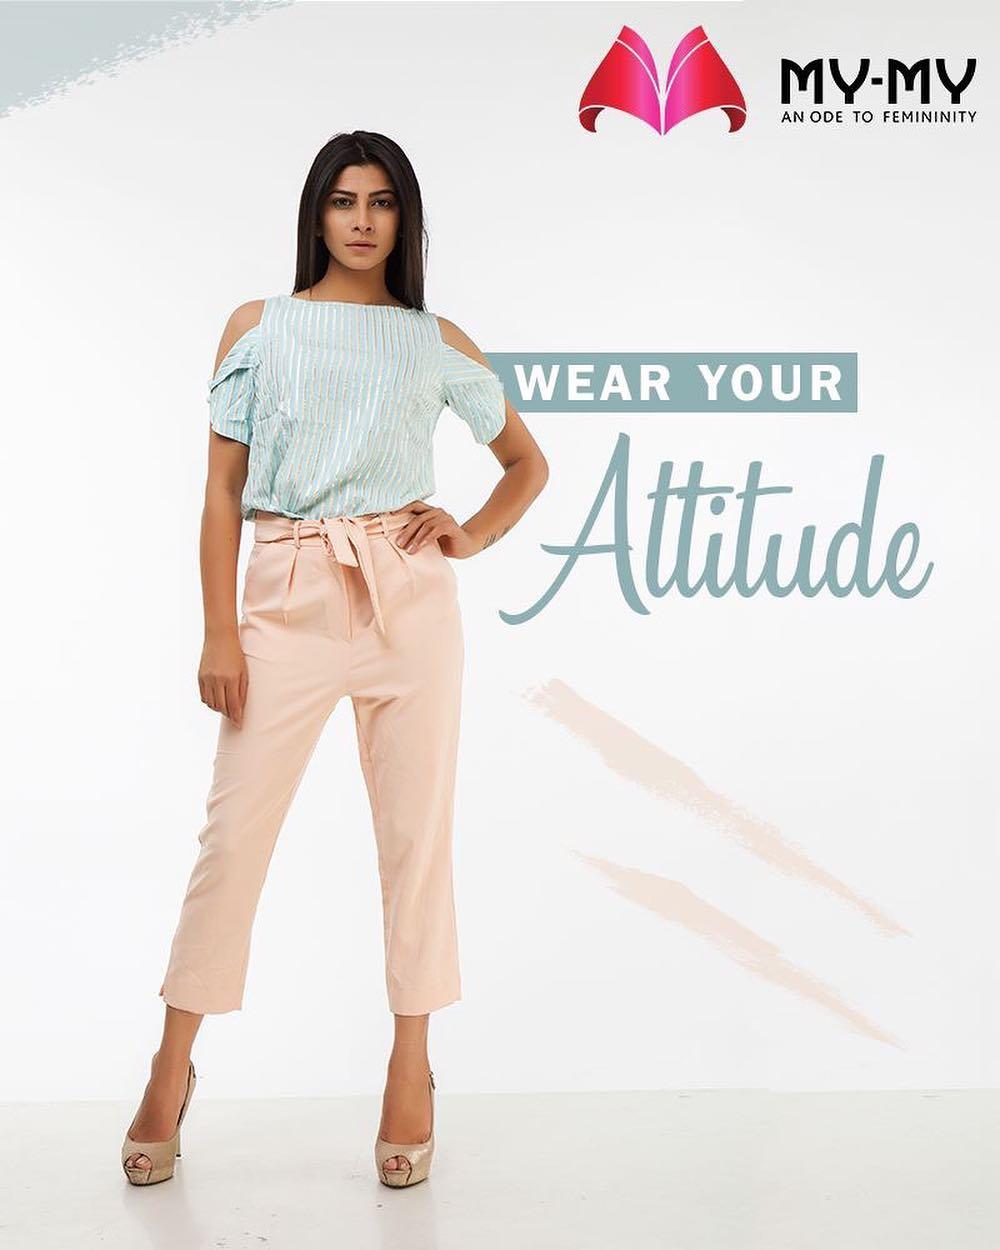 Keep Calm and Wear your #Attitude!  #SummerWardrobe #MyMy #MyMyAhmedabad #Fashion #Ahmedabad